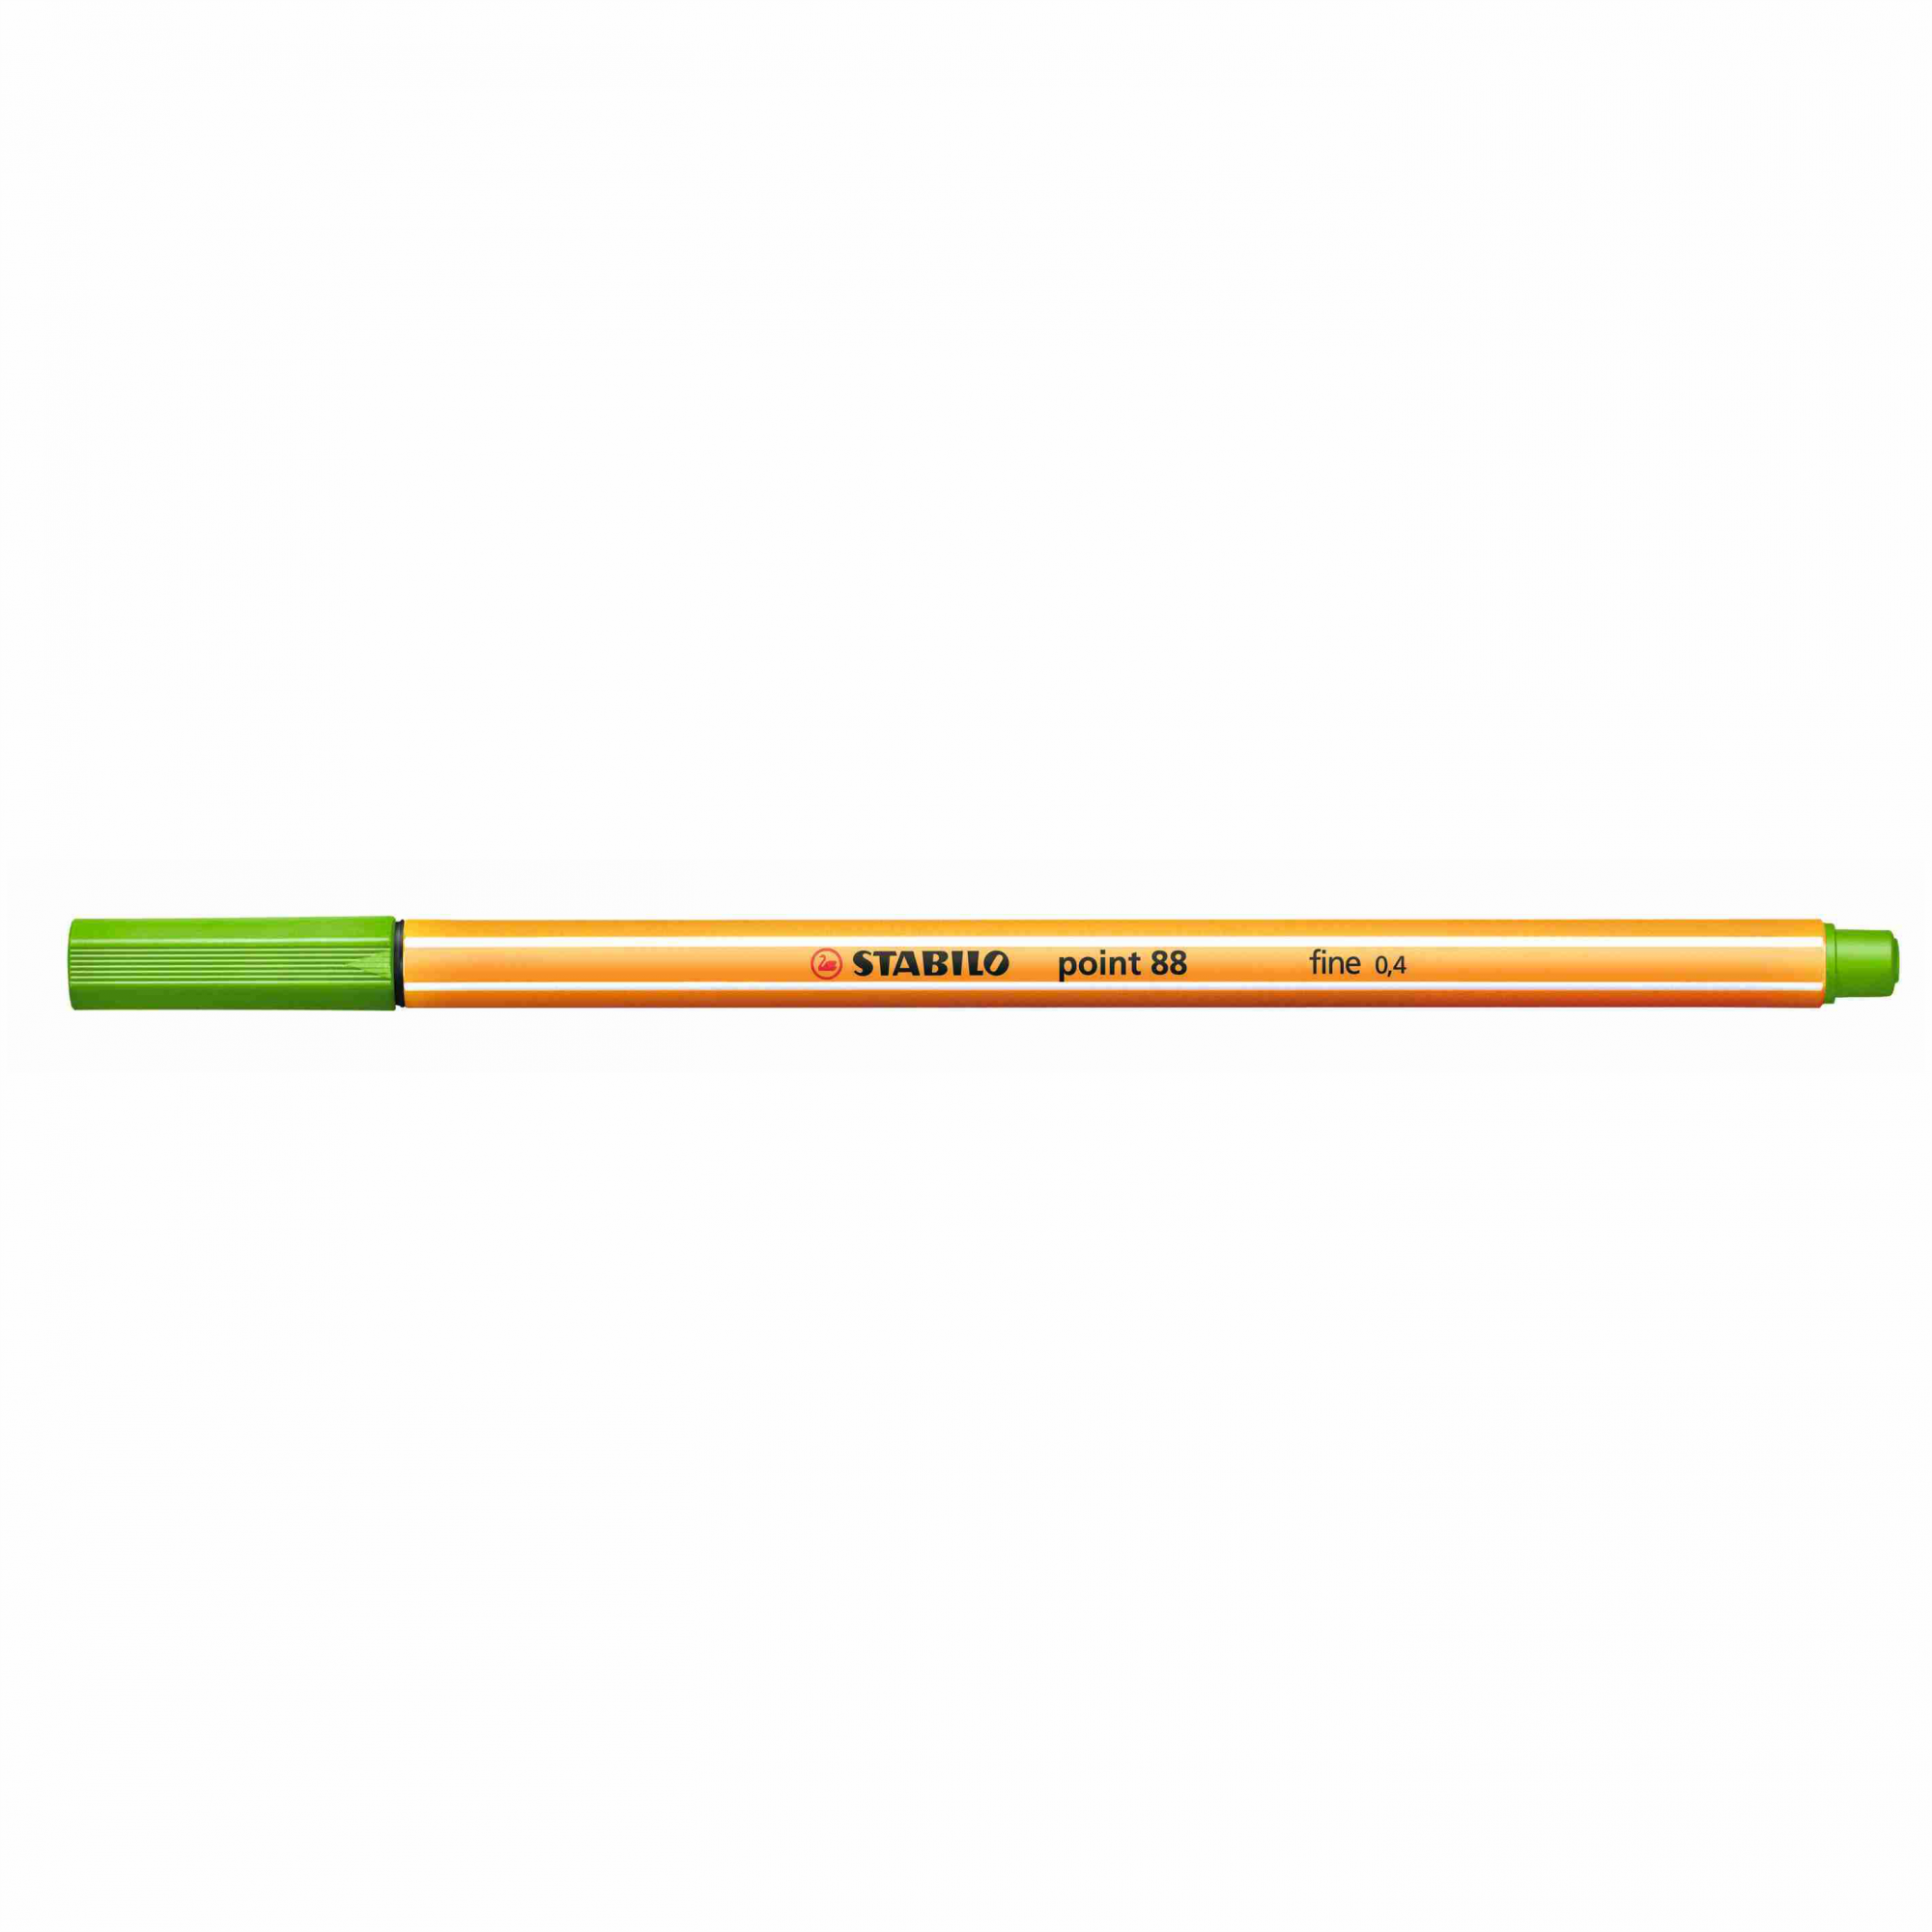 Caneta Hidrográfica 0.4 verde claro POINT 88 Stabilo